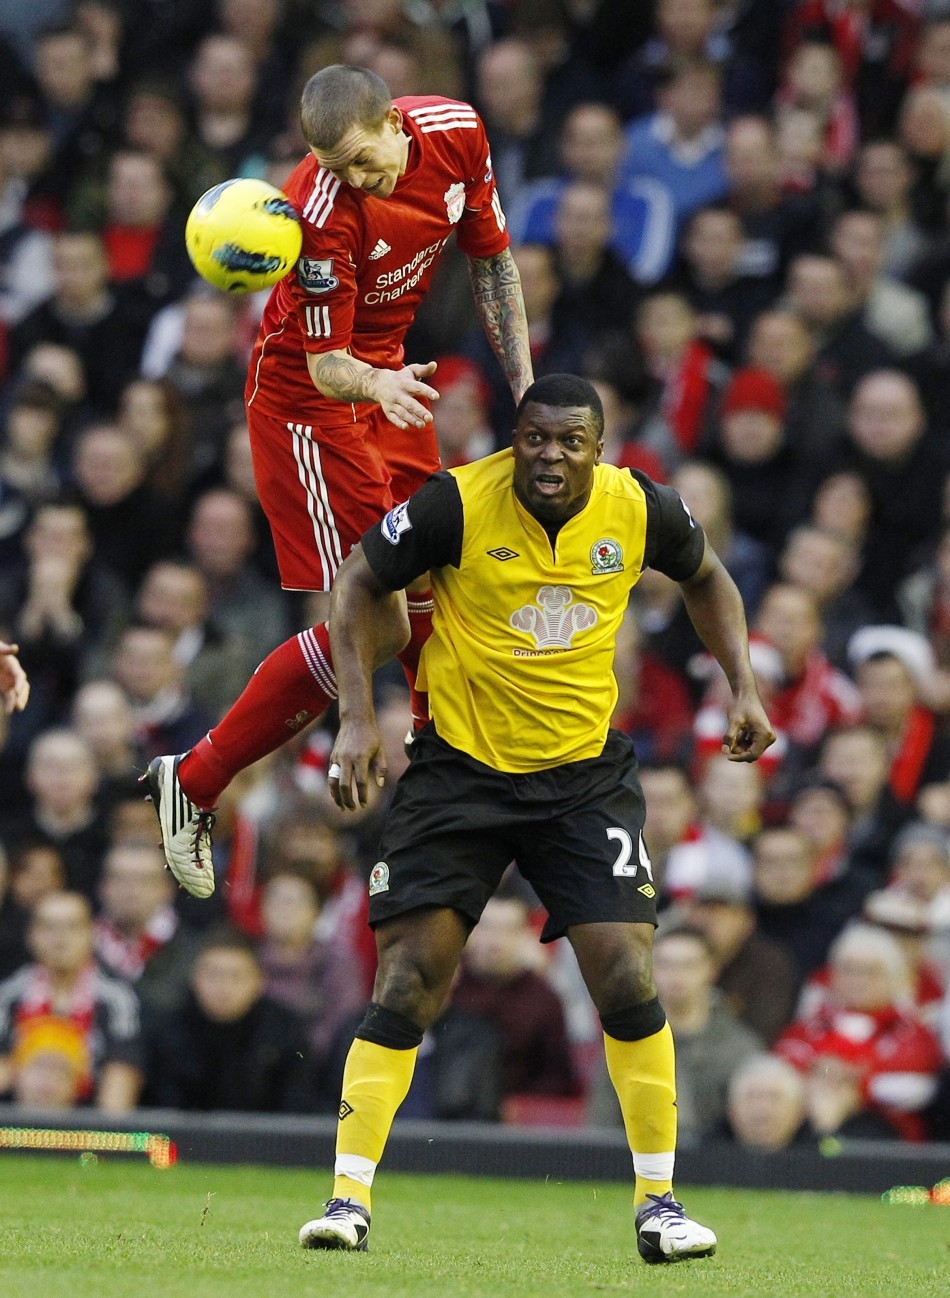 Liverpool-Blackburn Rovers